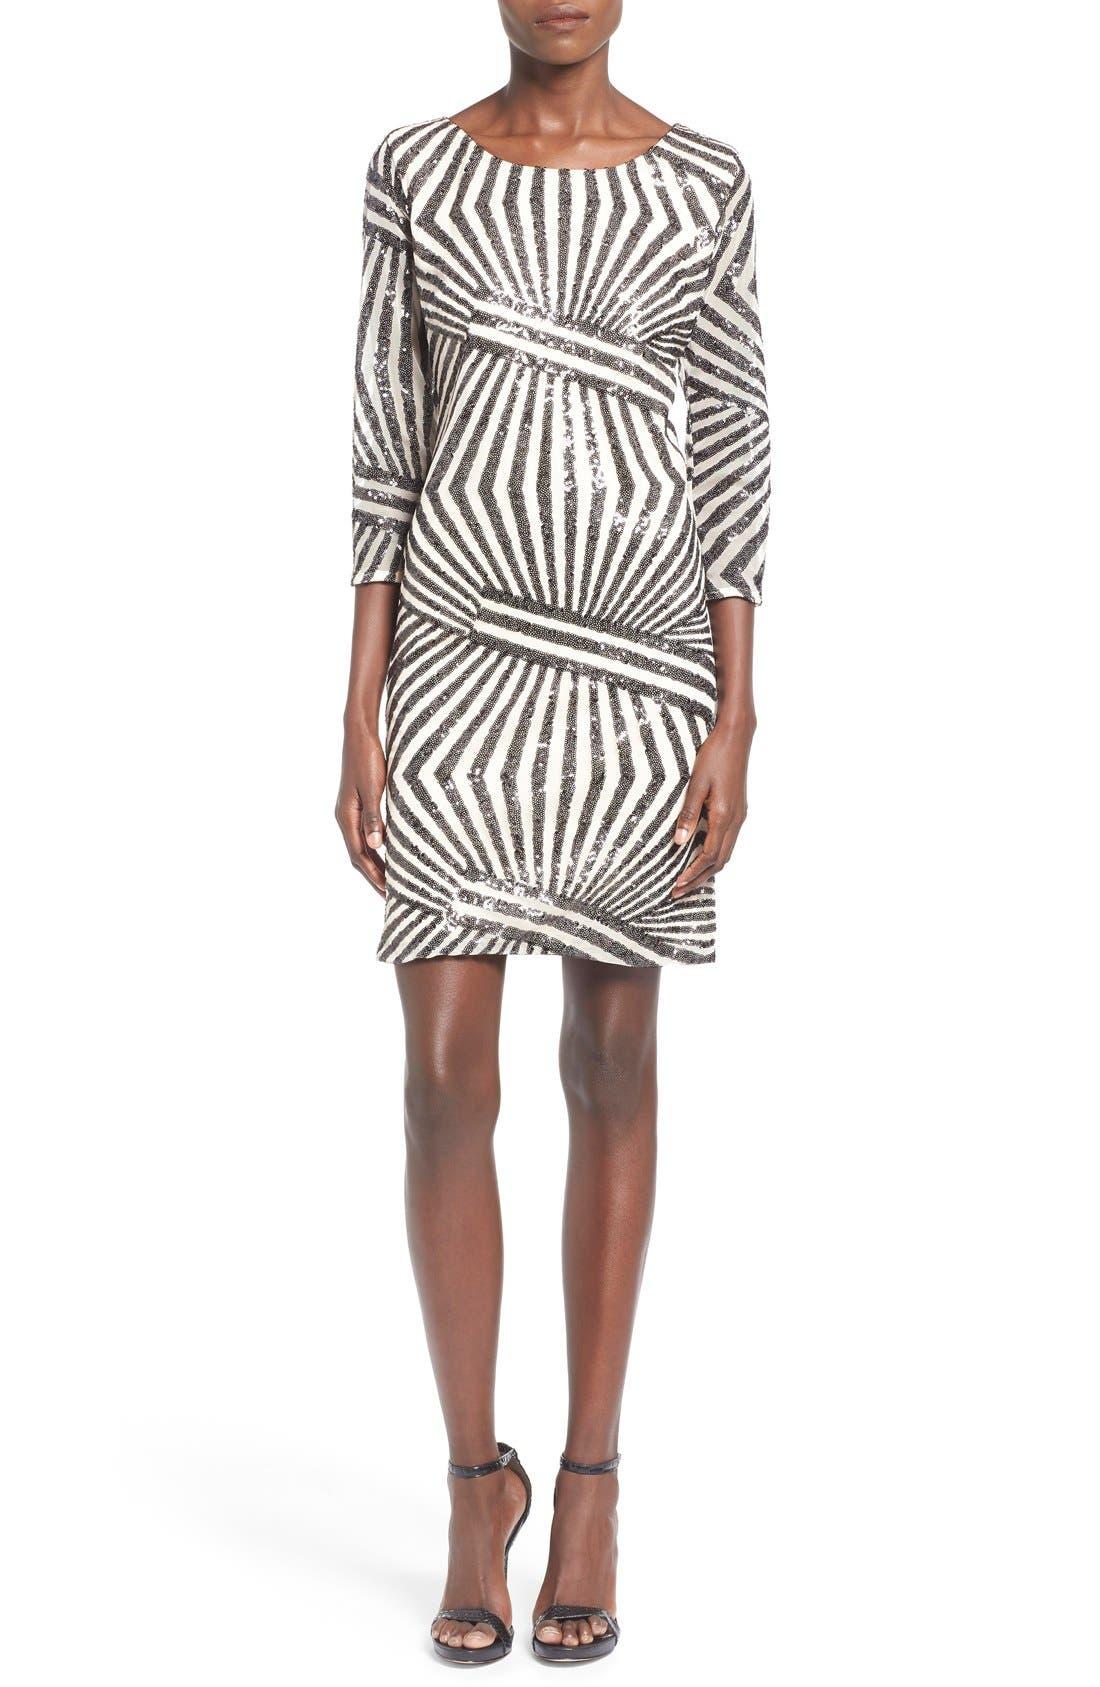 Alternate Image 1 Selected - Sequin Hearts Sequin Stripe Body-Con Dress